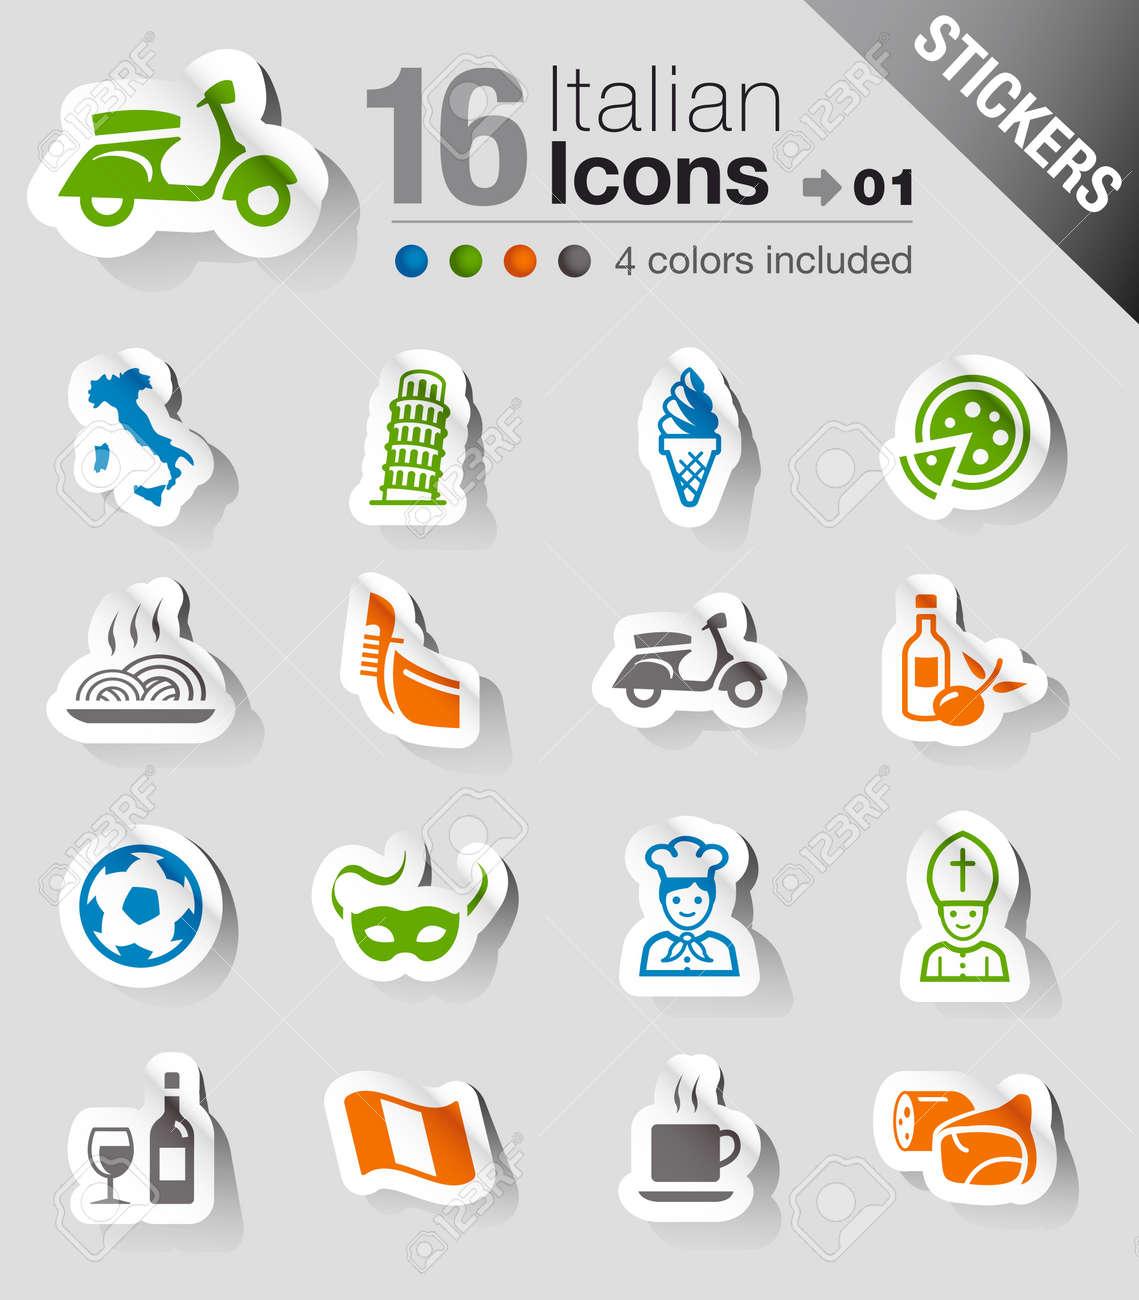 Stickers - Italian Icons Stock Vector - 13384381